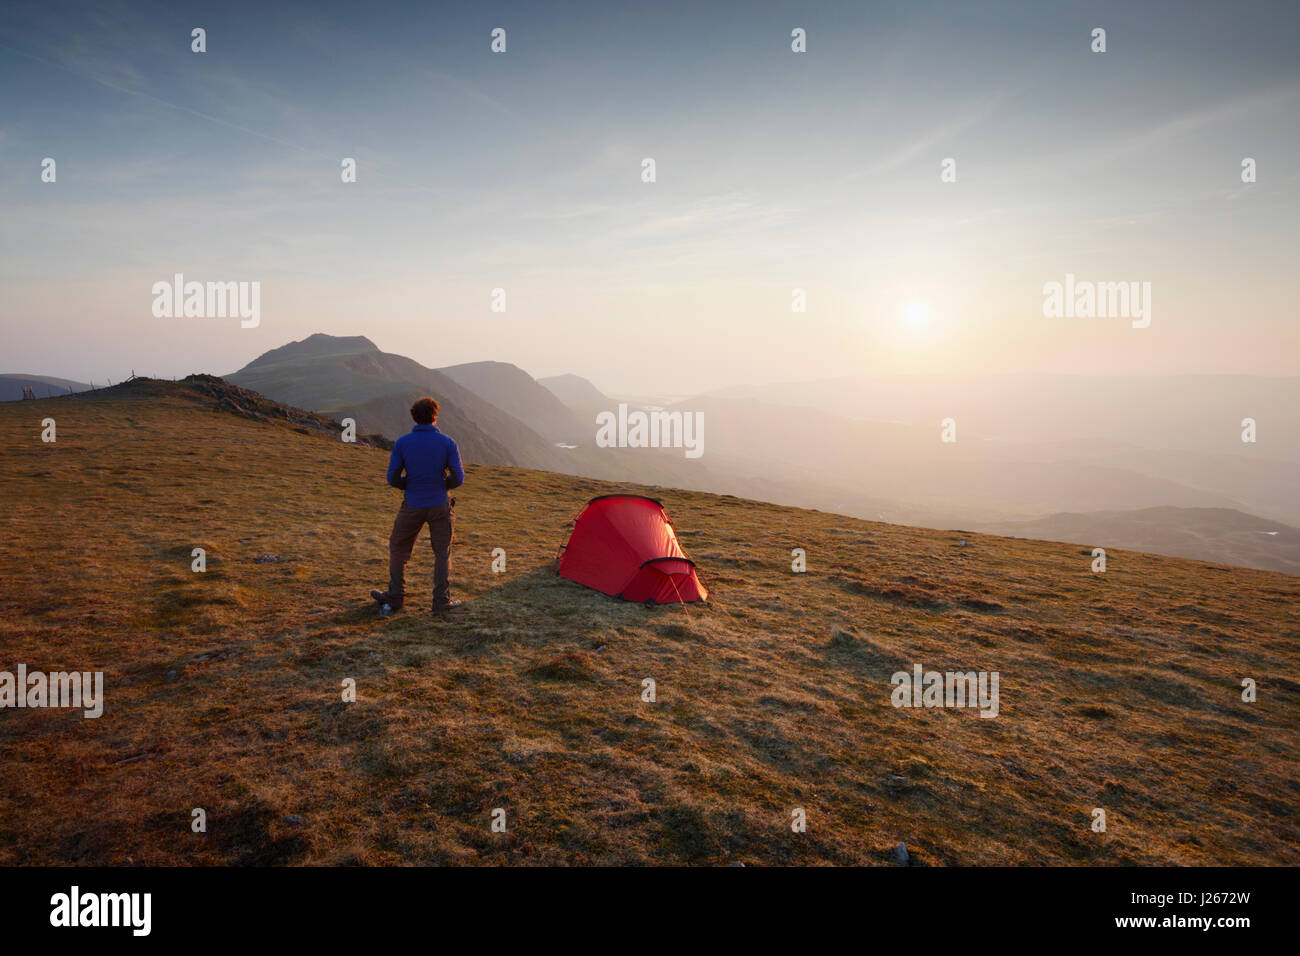 Wild Camping on Mynydd Moel, part of the Cadair Idris massif. Snowdonia National Park. Wales. UK. - Stock Image